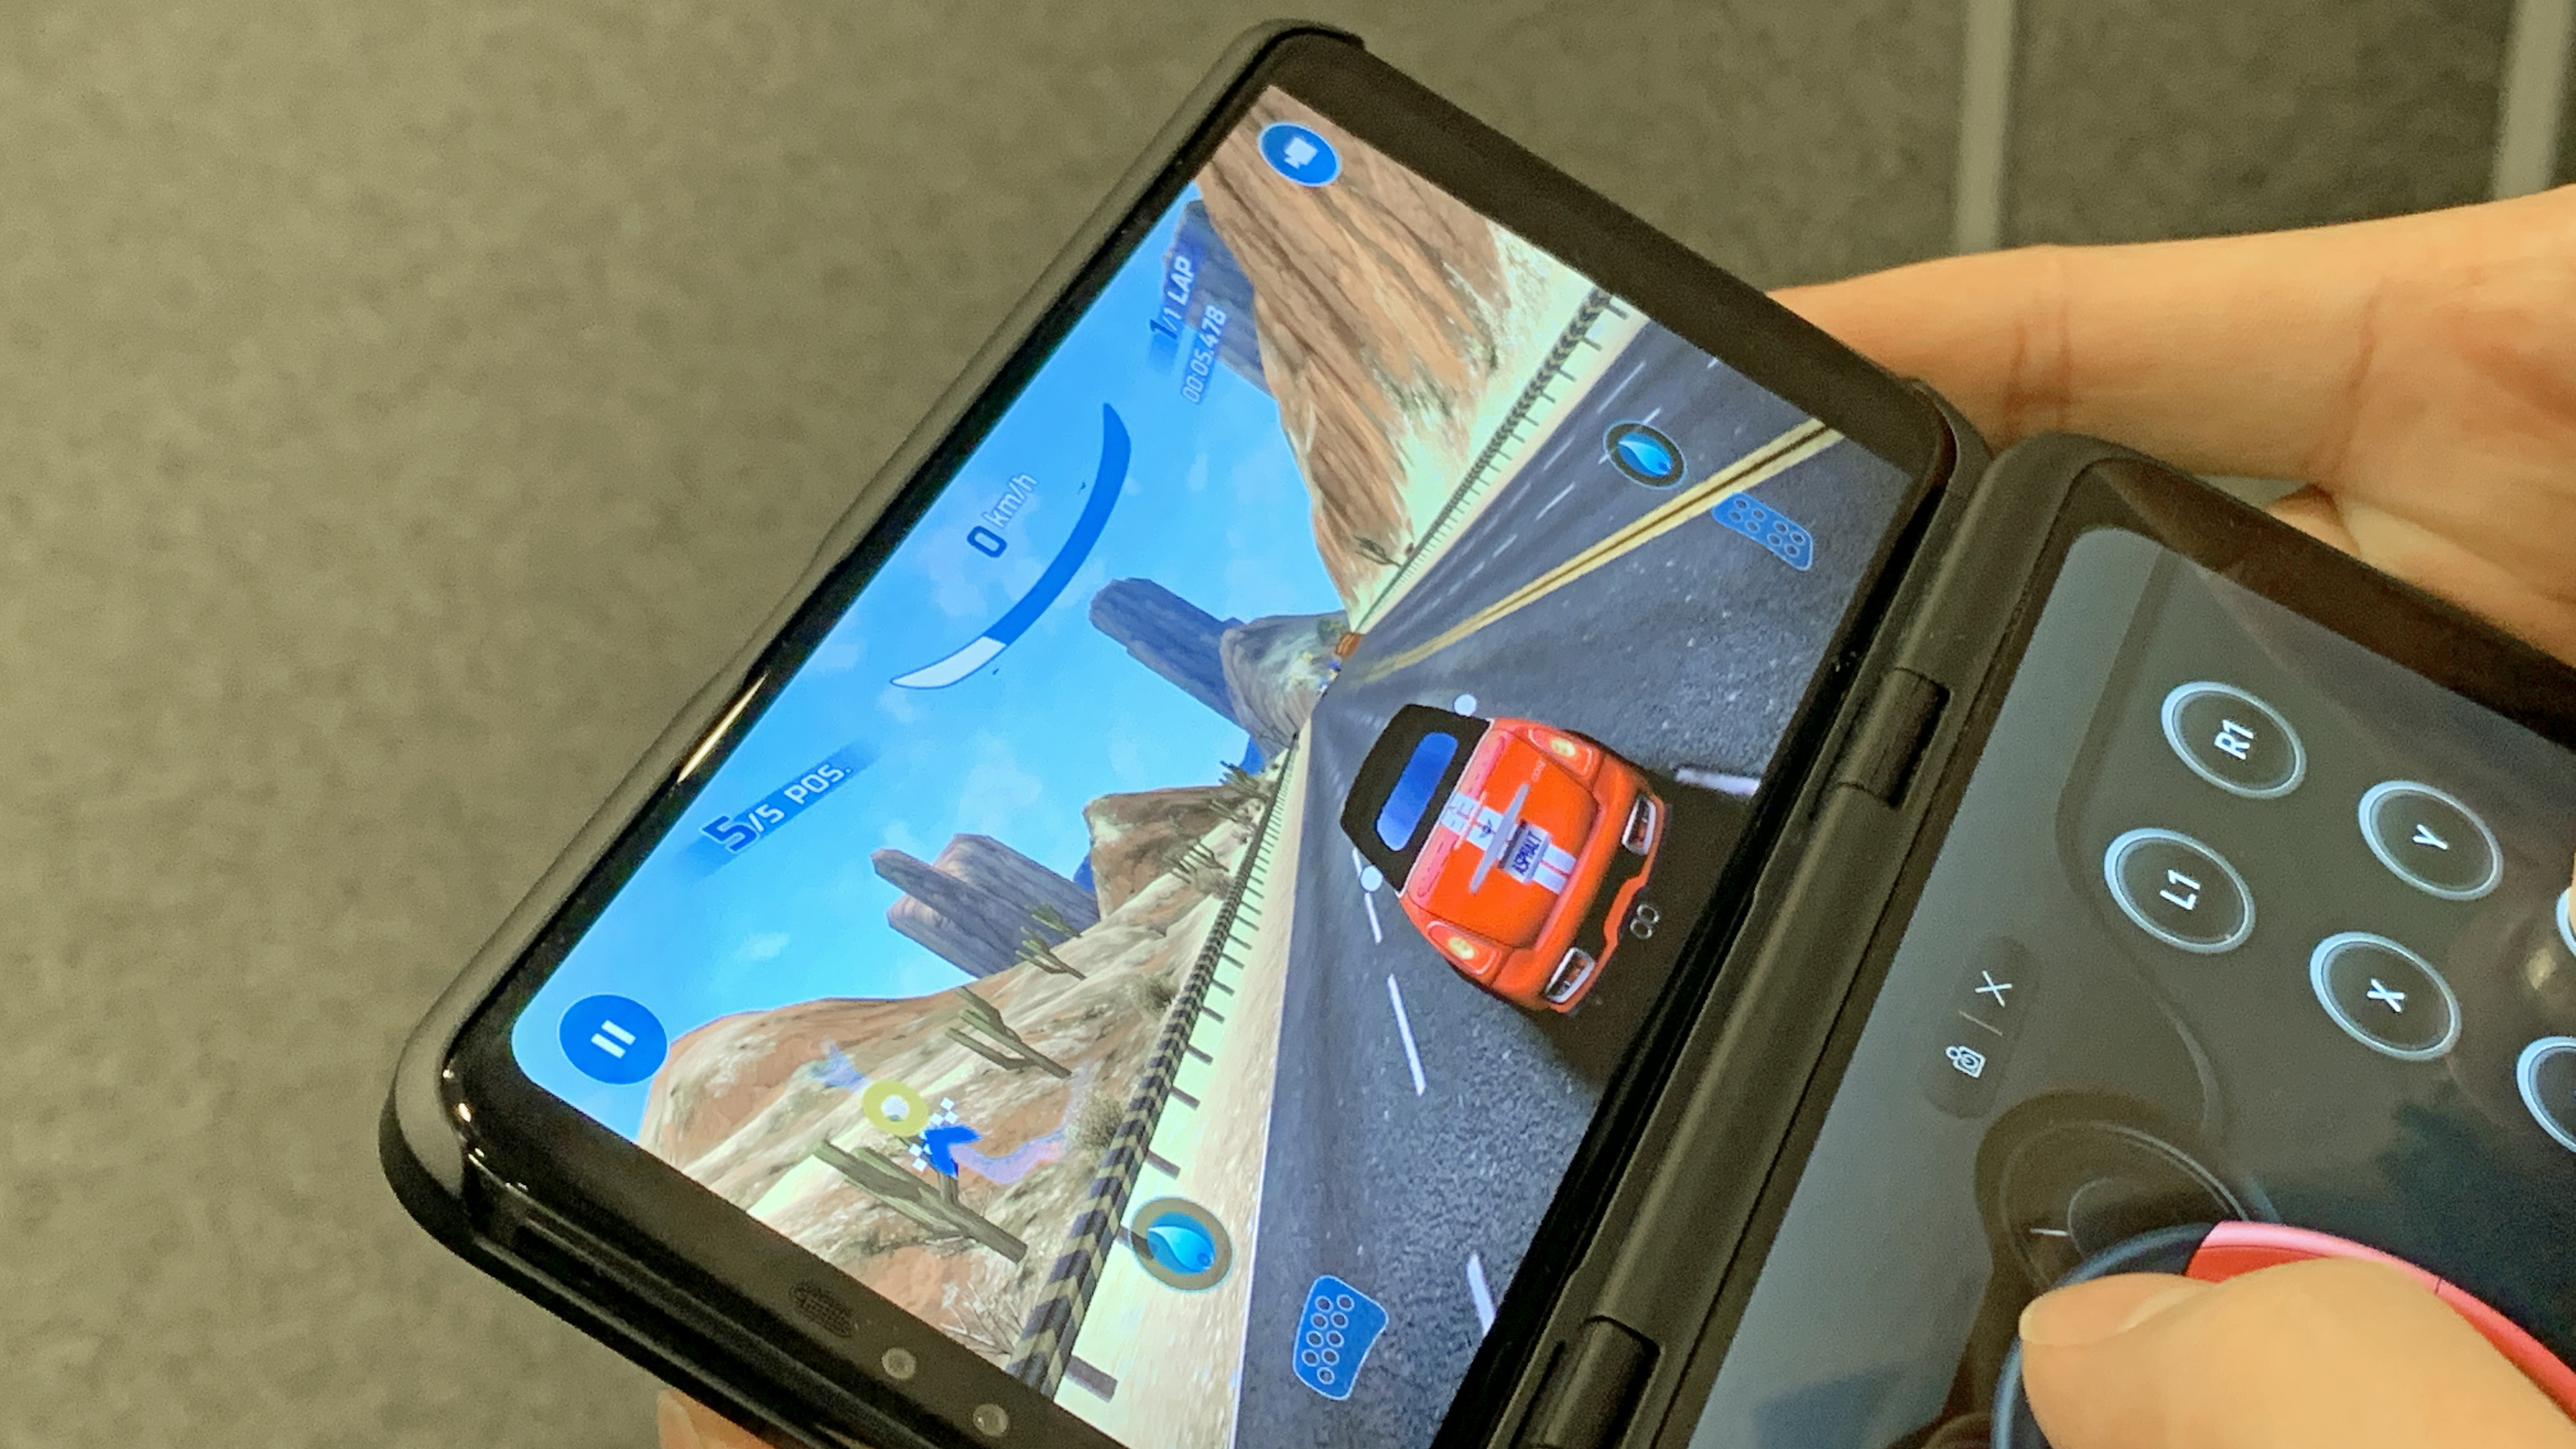 DualScreen: first look LG's alternative UPvaRWq3dXH4gR4PqdfC